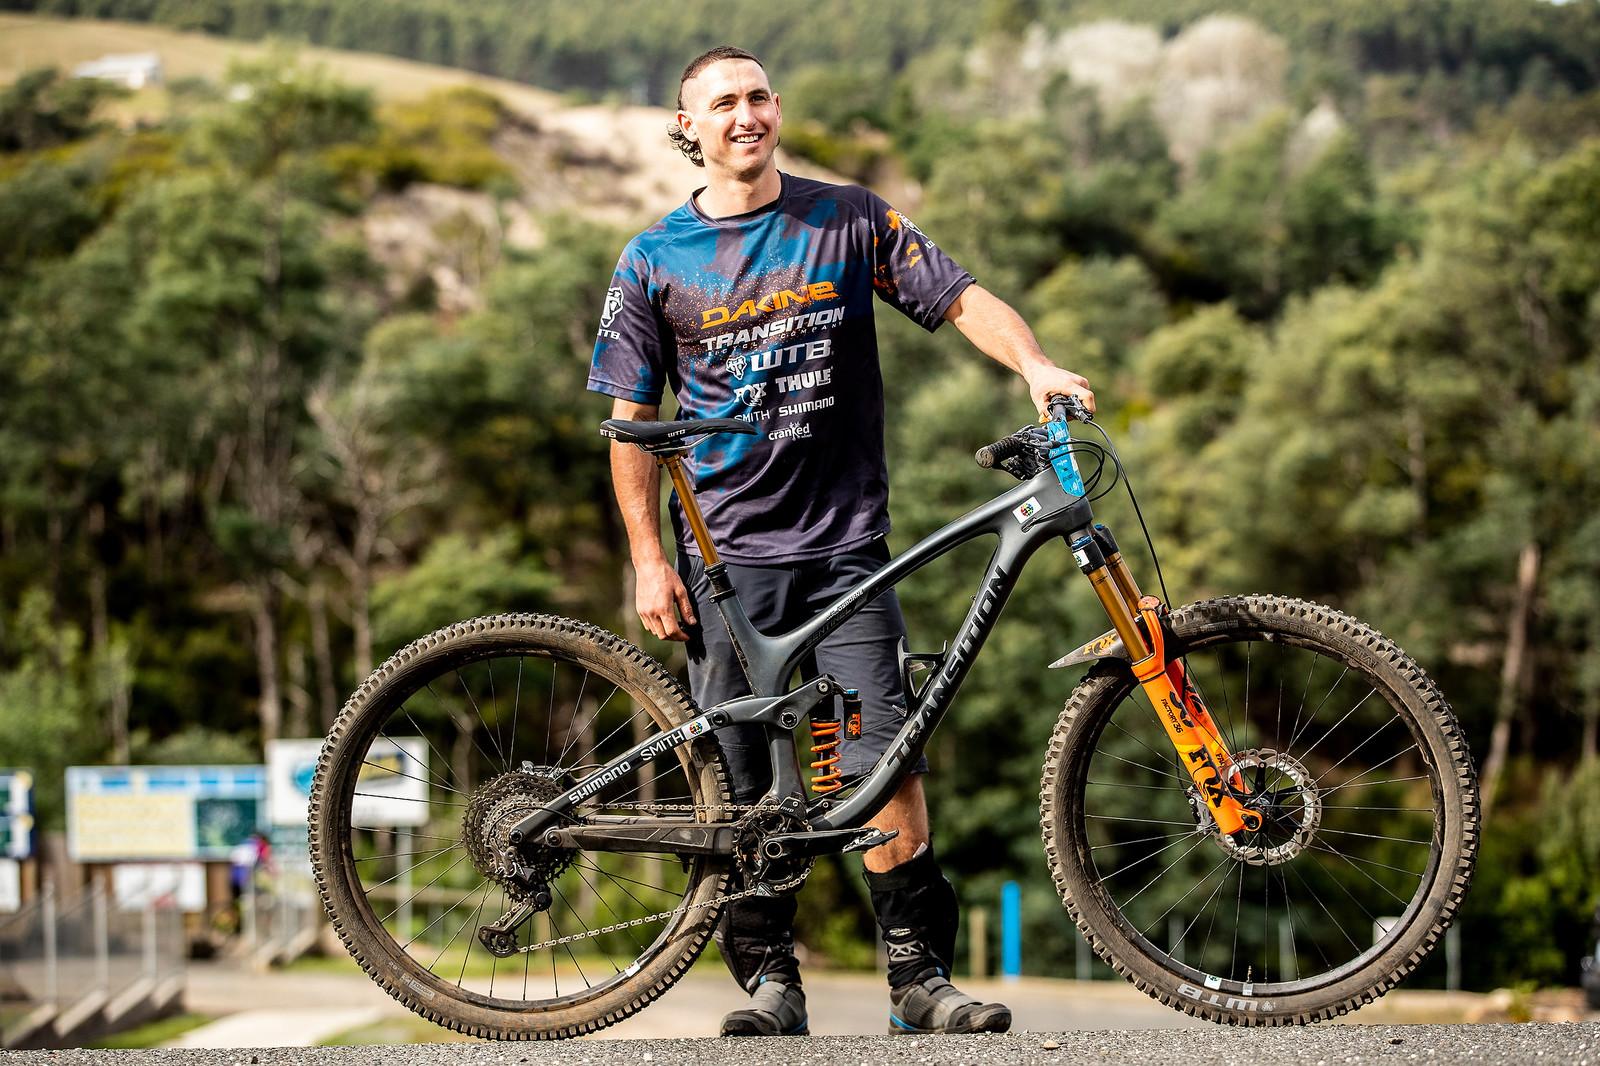 Marco Osborne's Transition Sentinel - What's Stock, What's Not - Tasmania Enduro World Series - Mountain Biking Pictures - Vital MTB